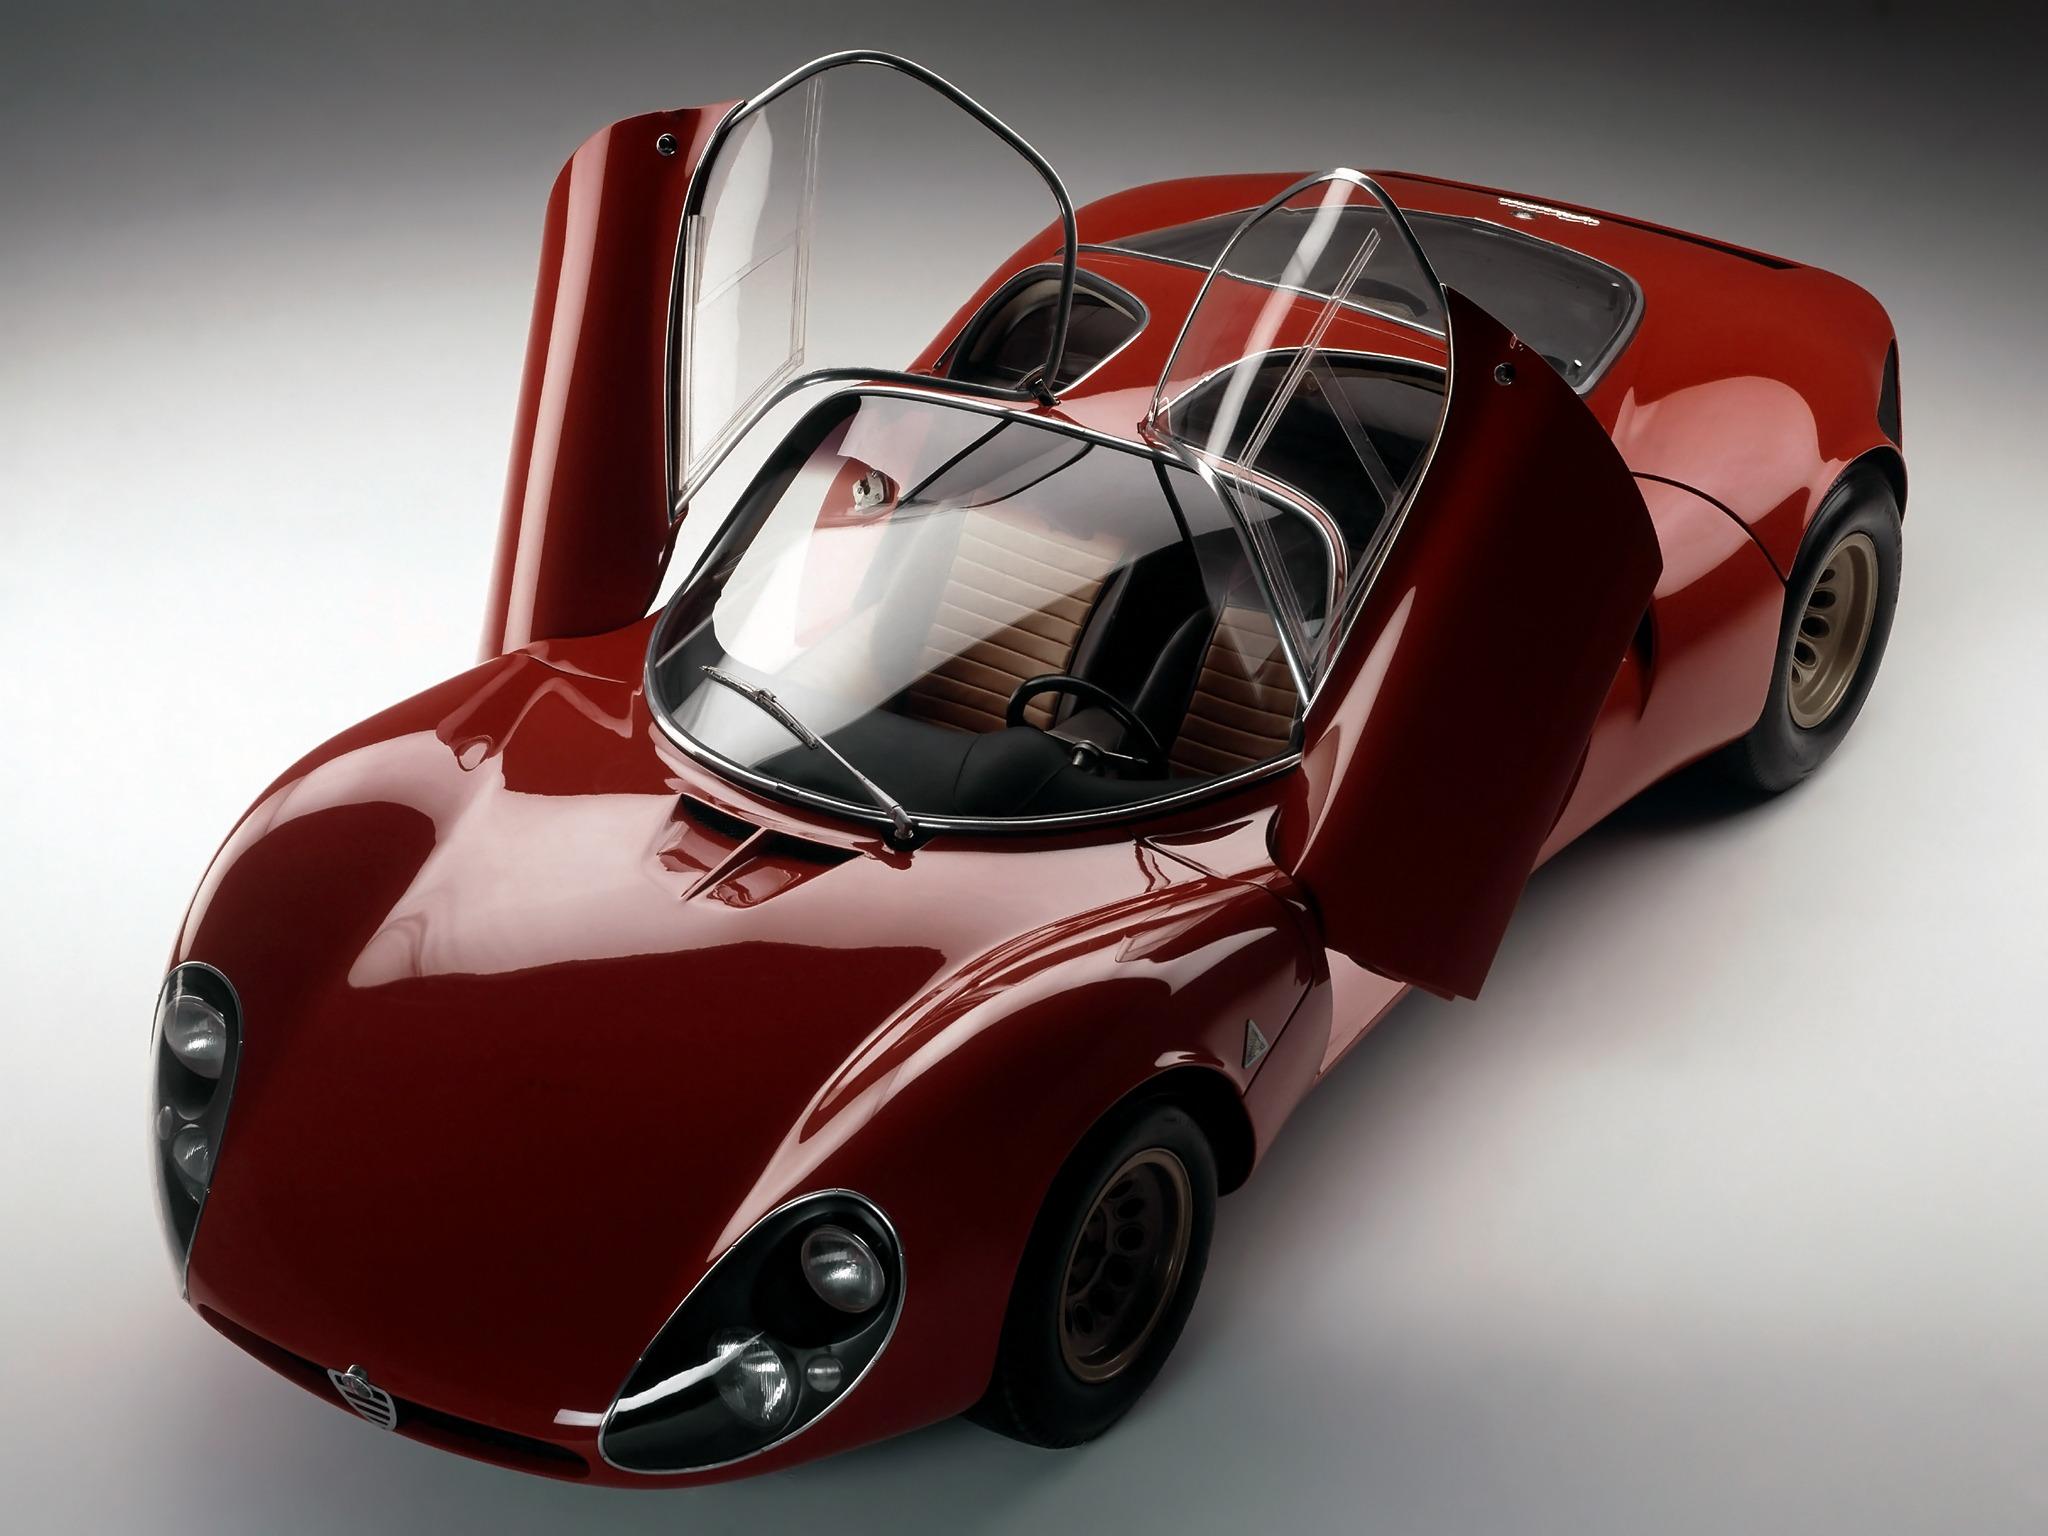 Alfa Romeo Tipo 33 Stradale 1967 Old Concept Cars